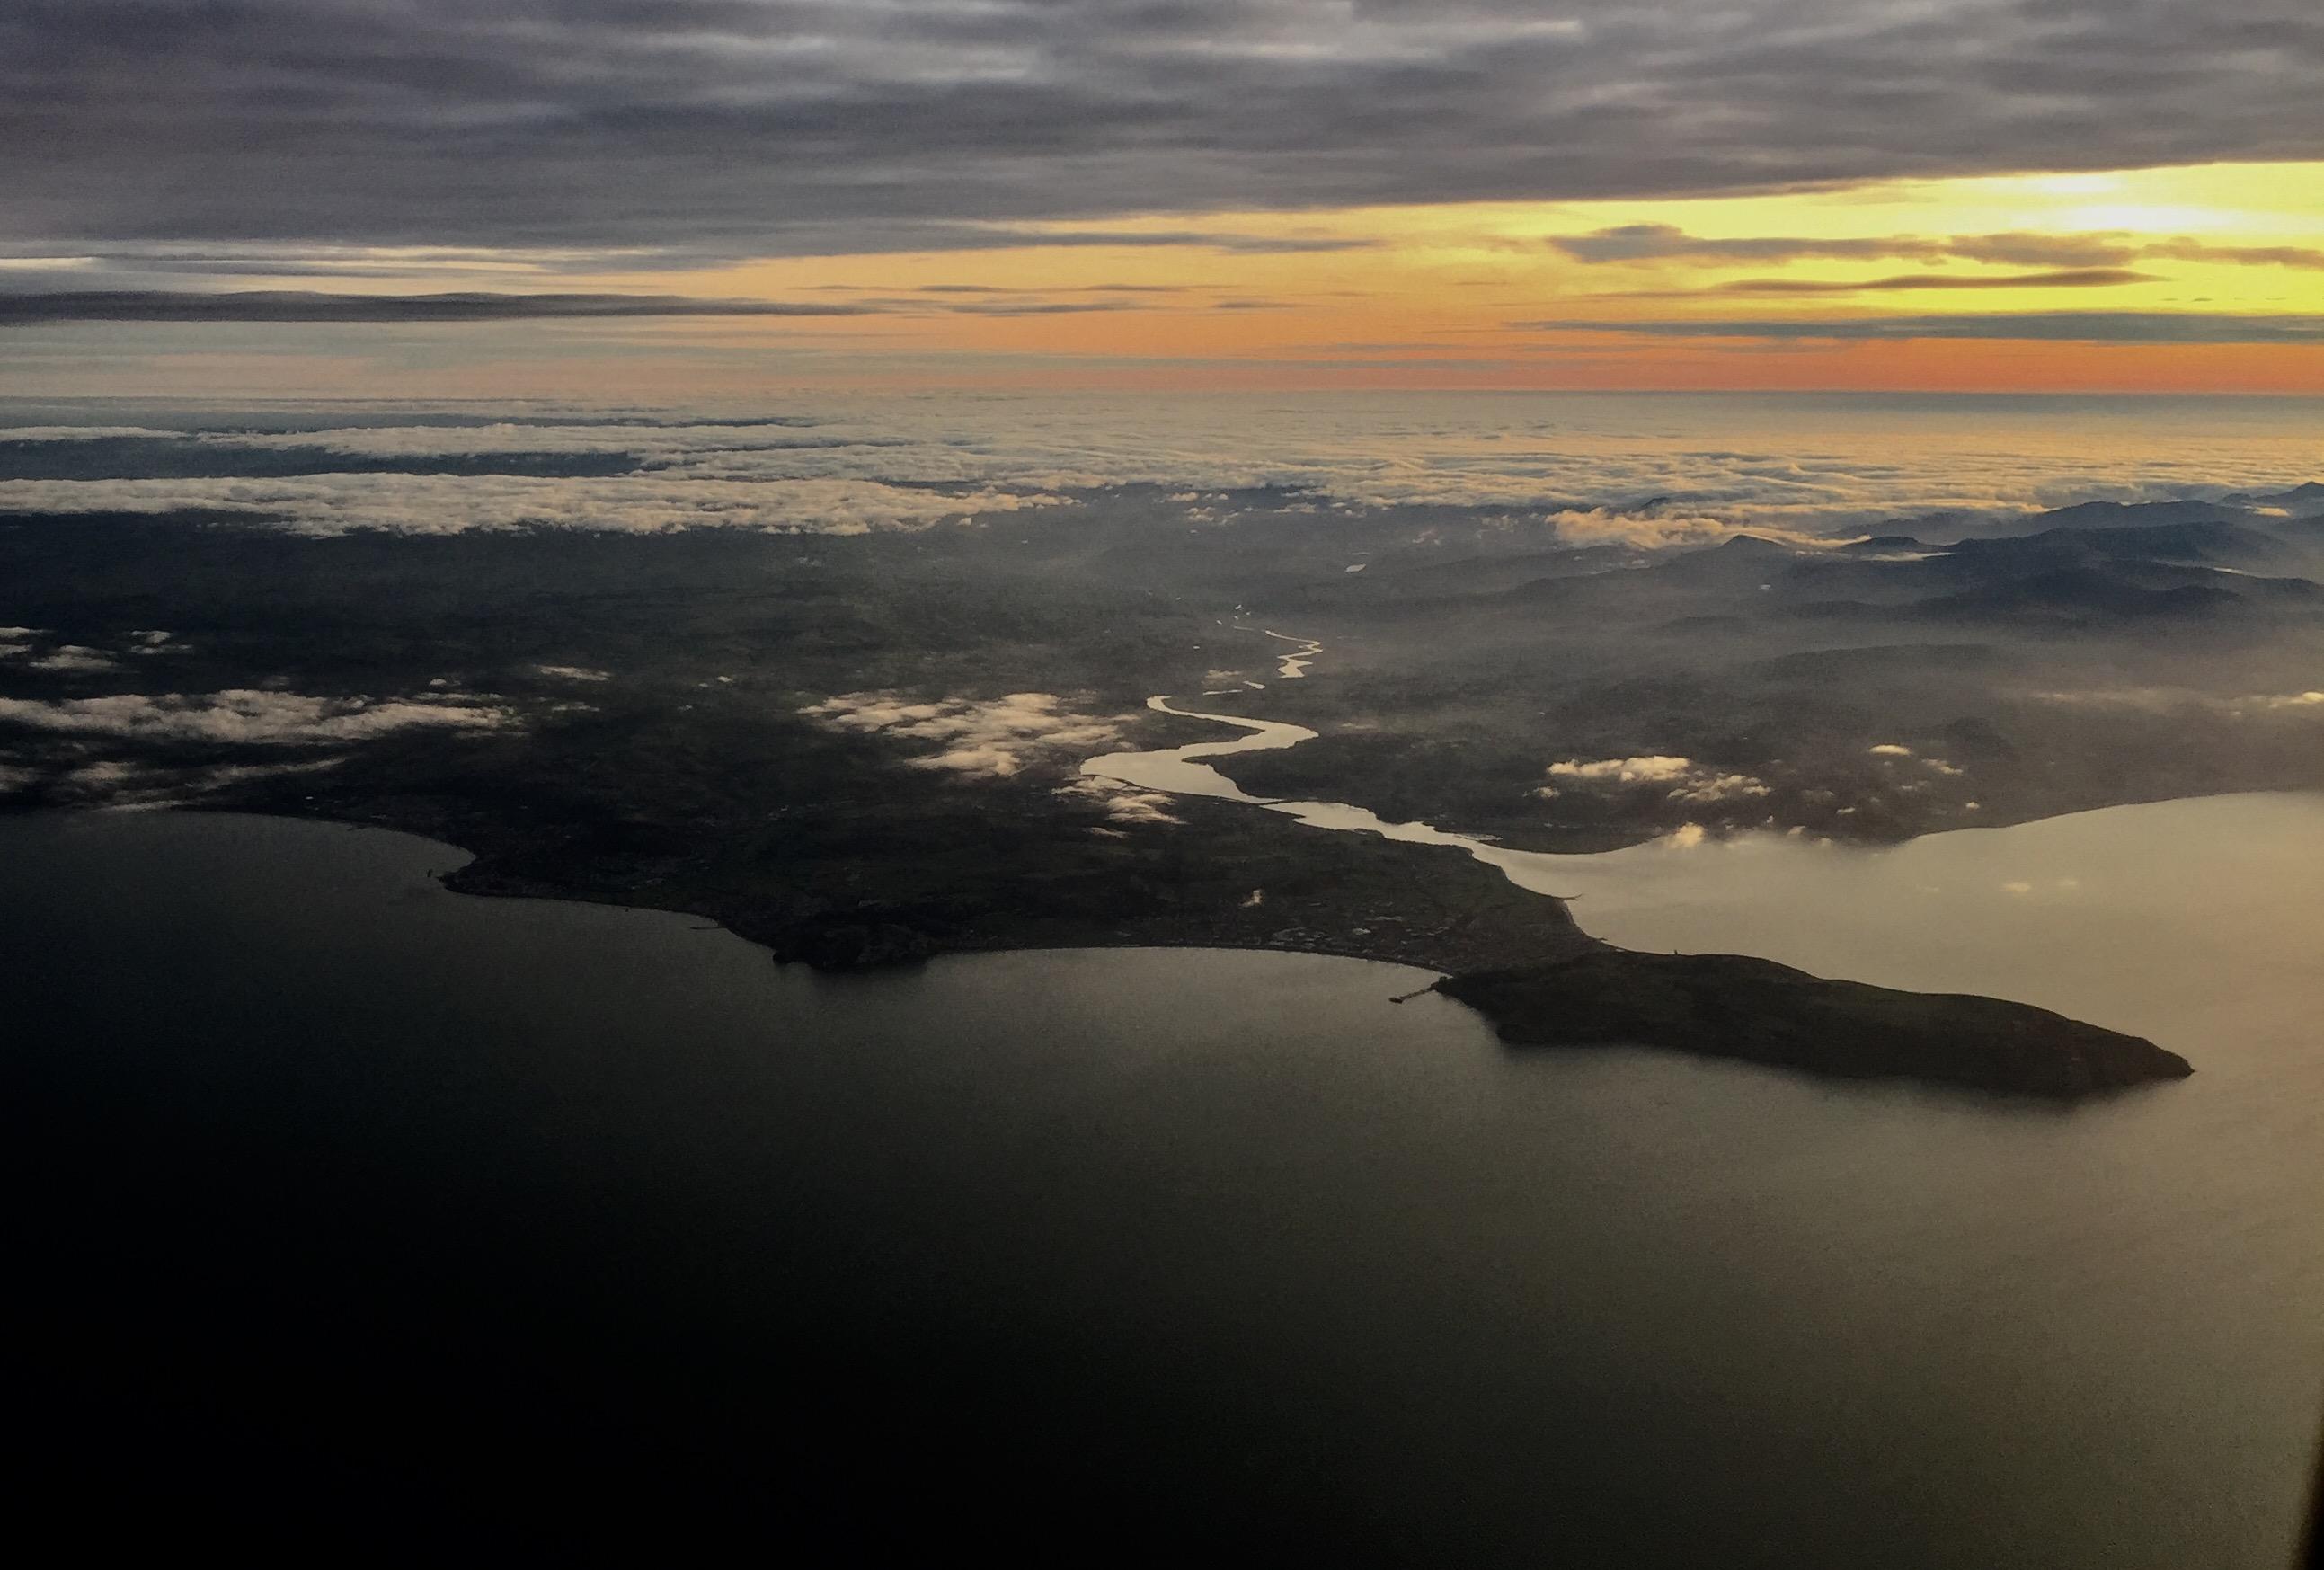 Llandudno from 2,000 Feet